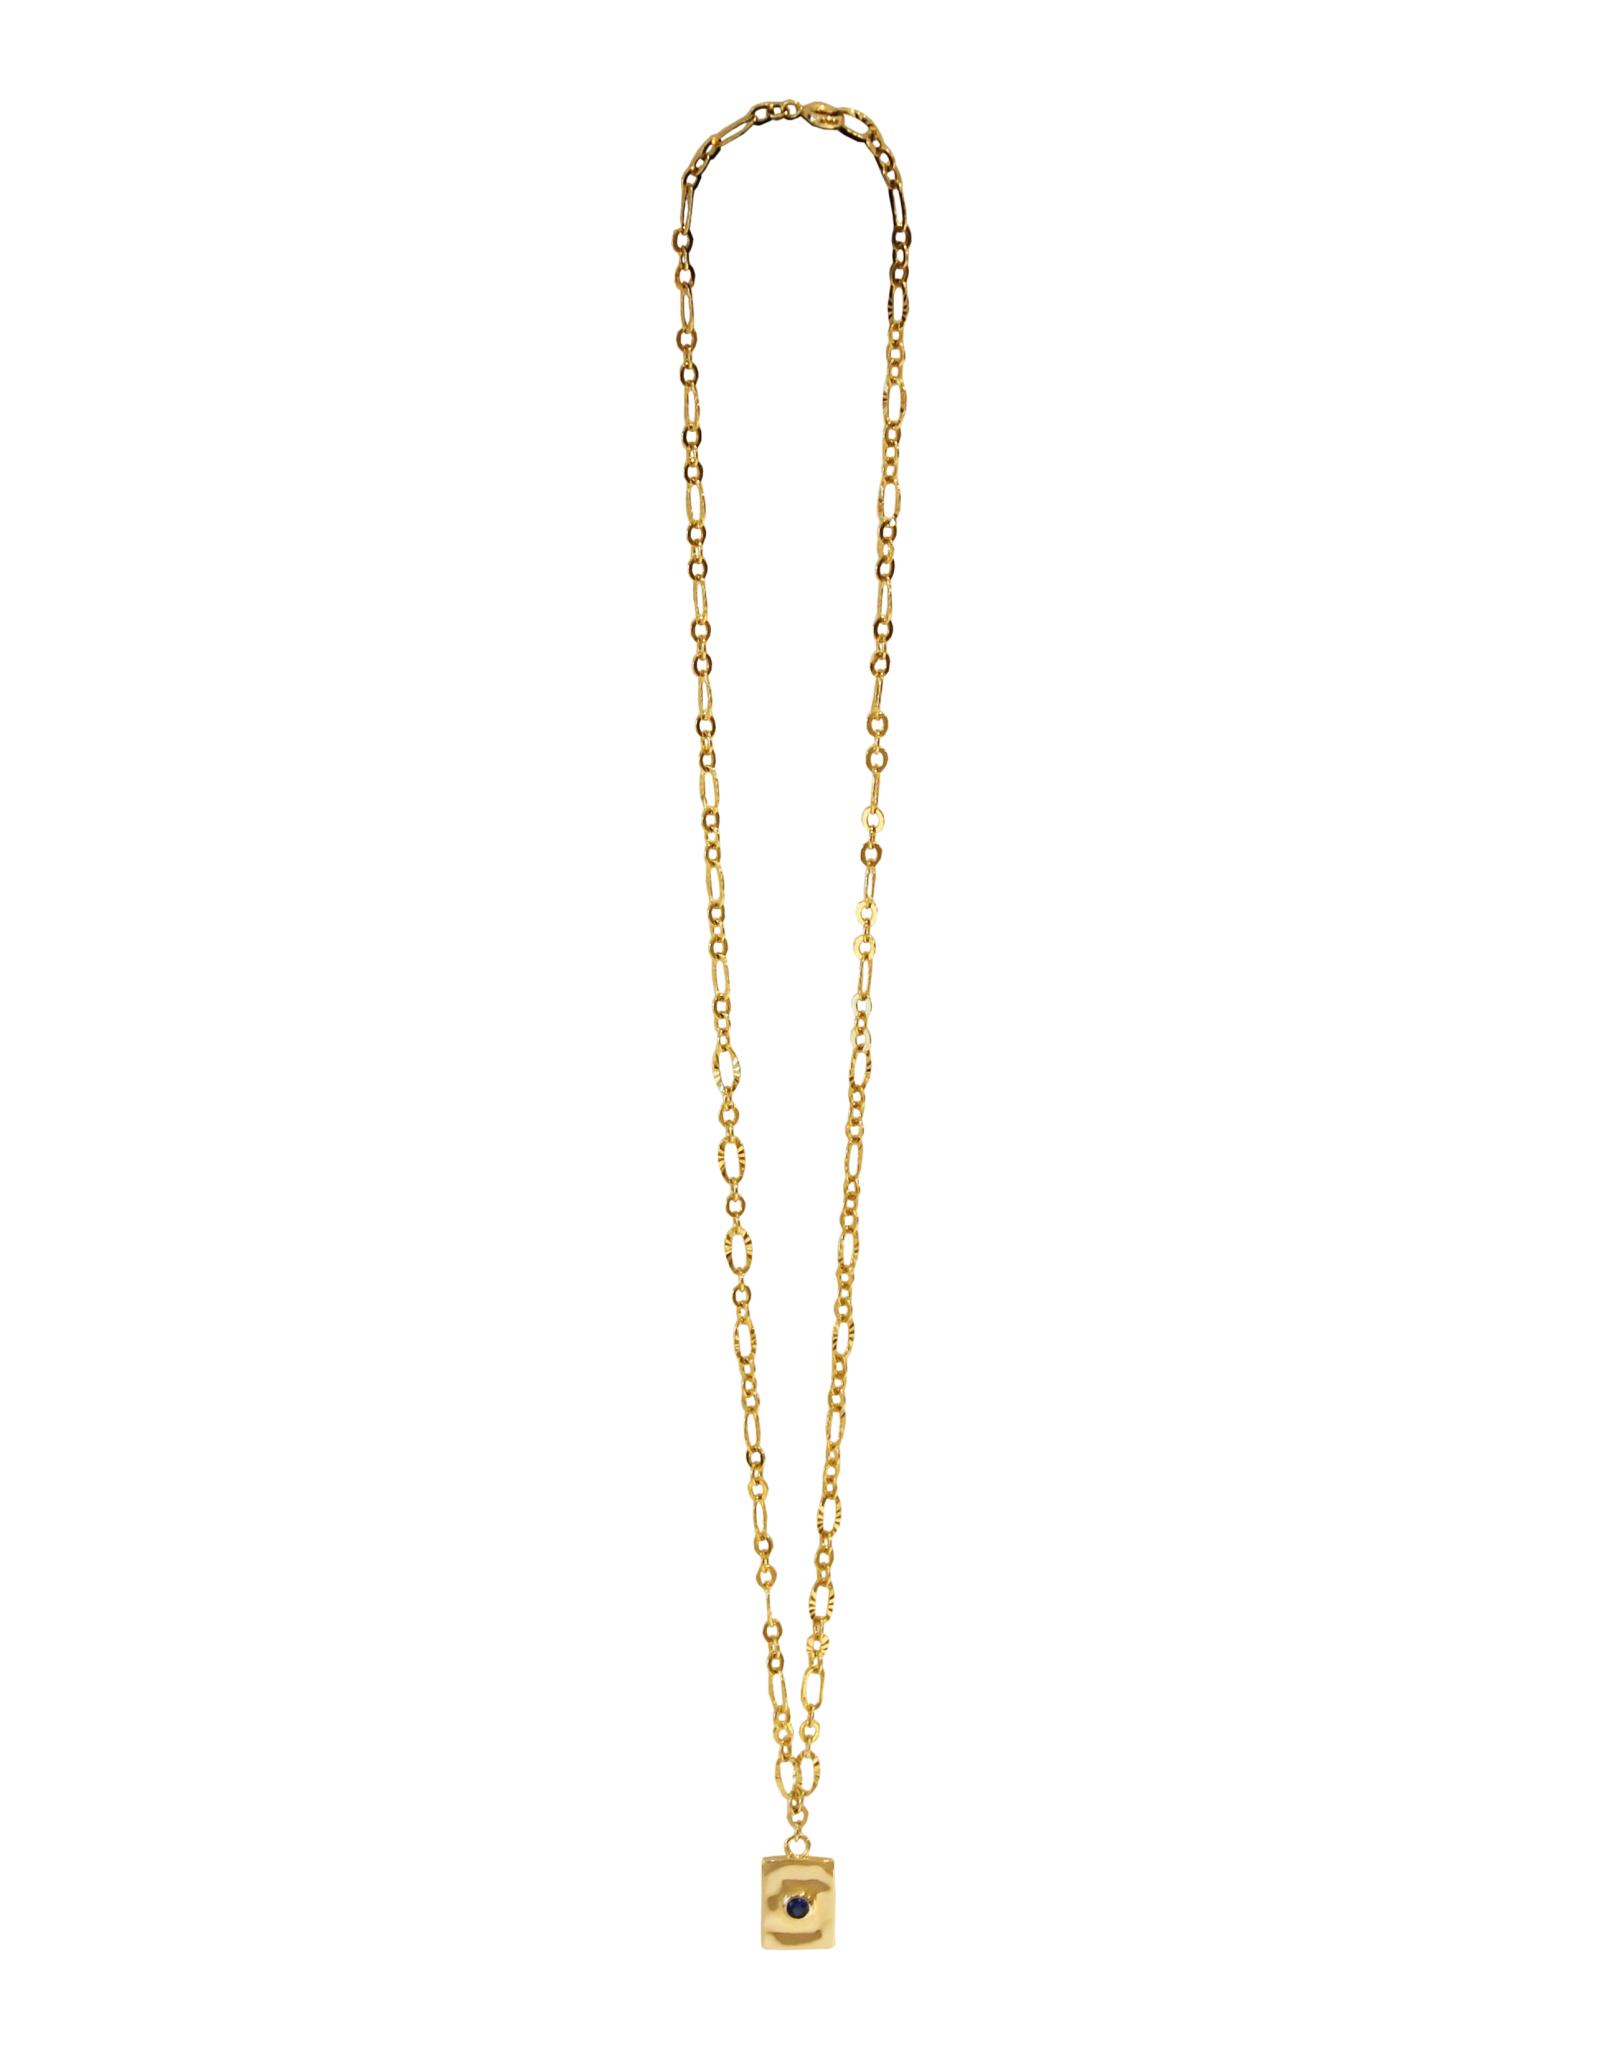 Vayu Jewels Luciene Necklace - Sapphire Blue